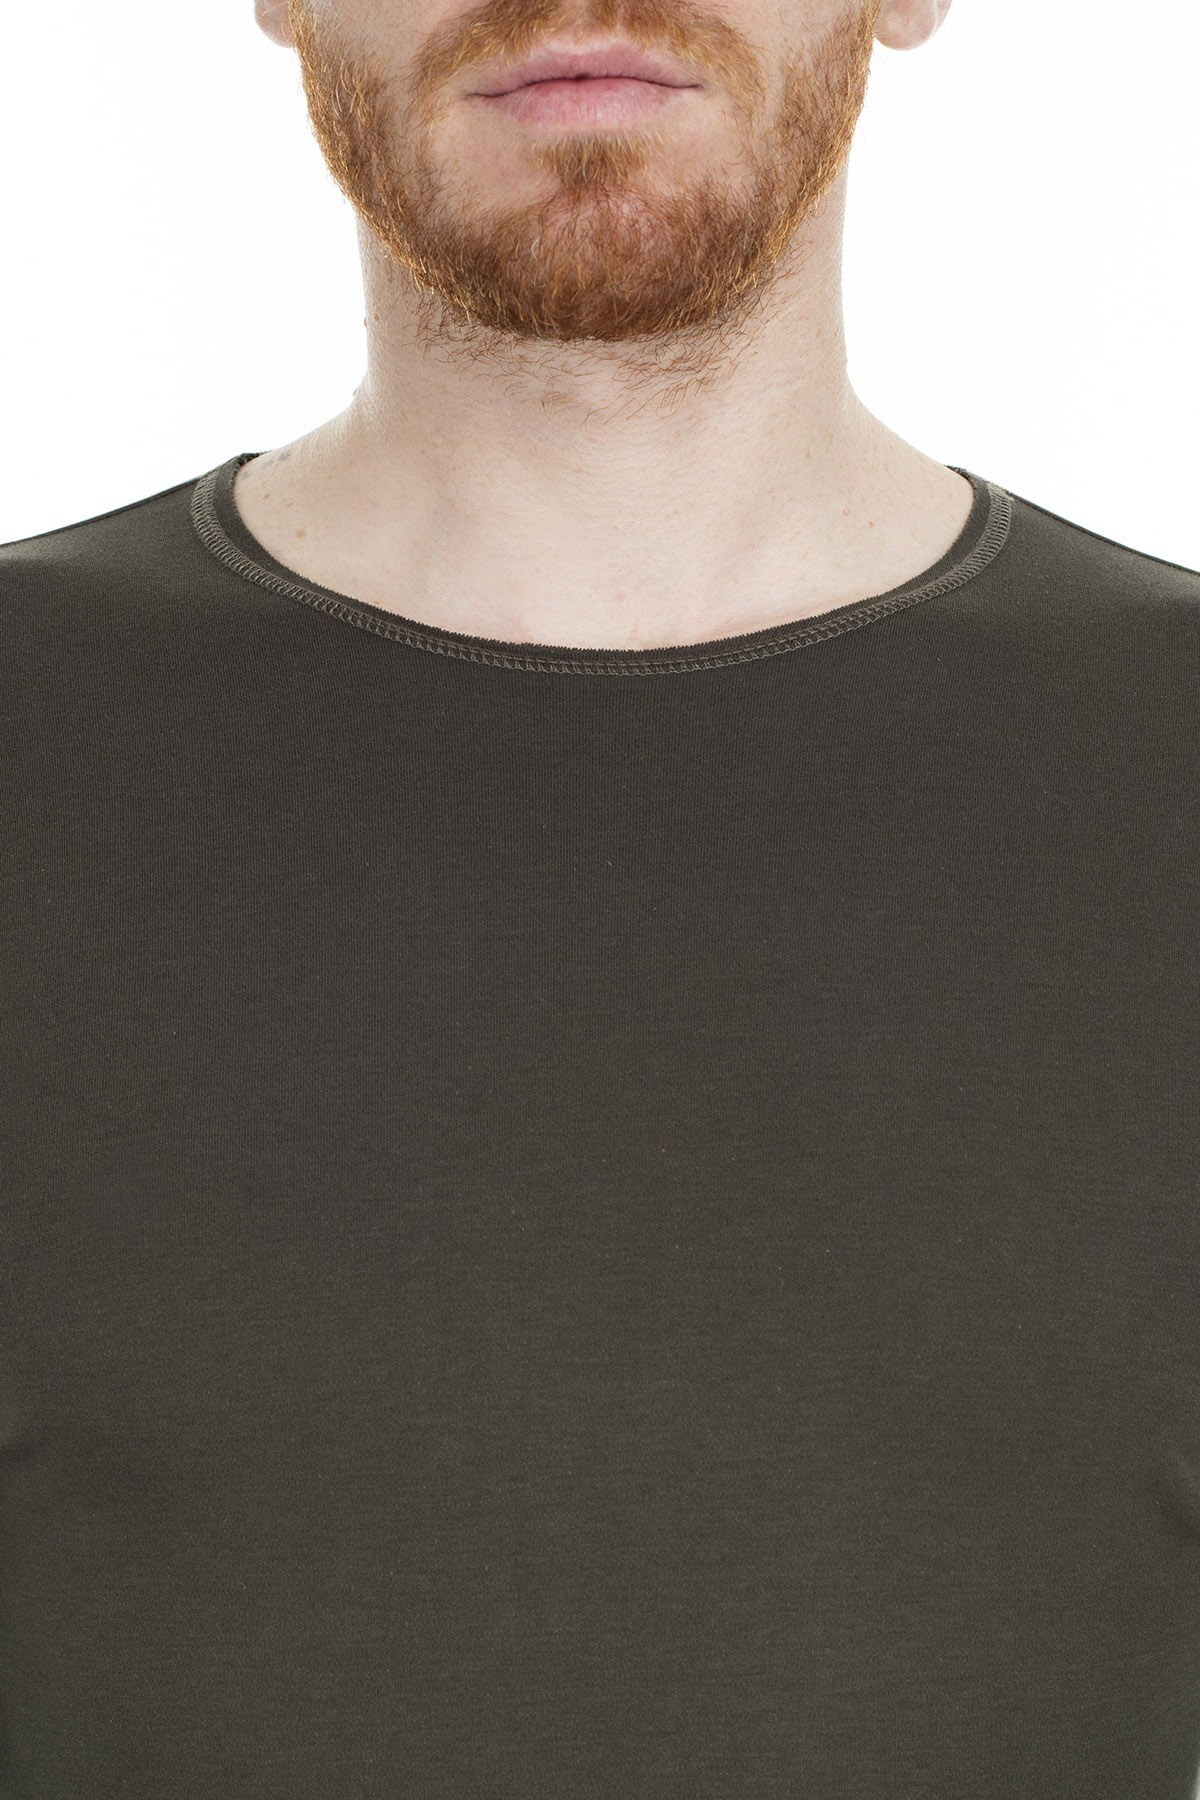 Armani Jeans Erkek T Shirt 6Y6T91 6J17Z 1861 HAKİ